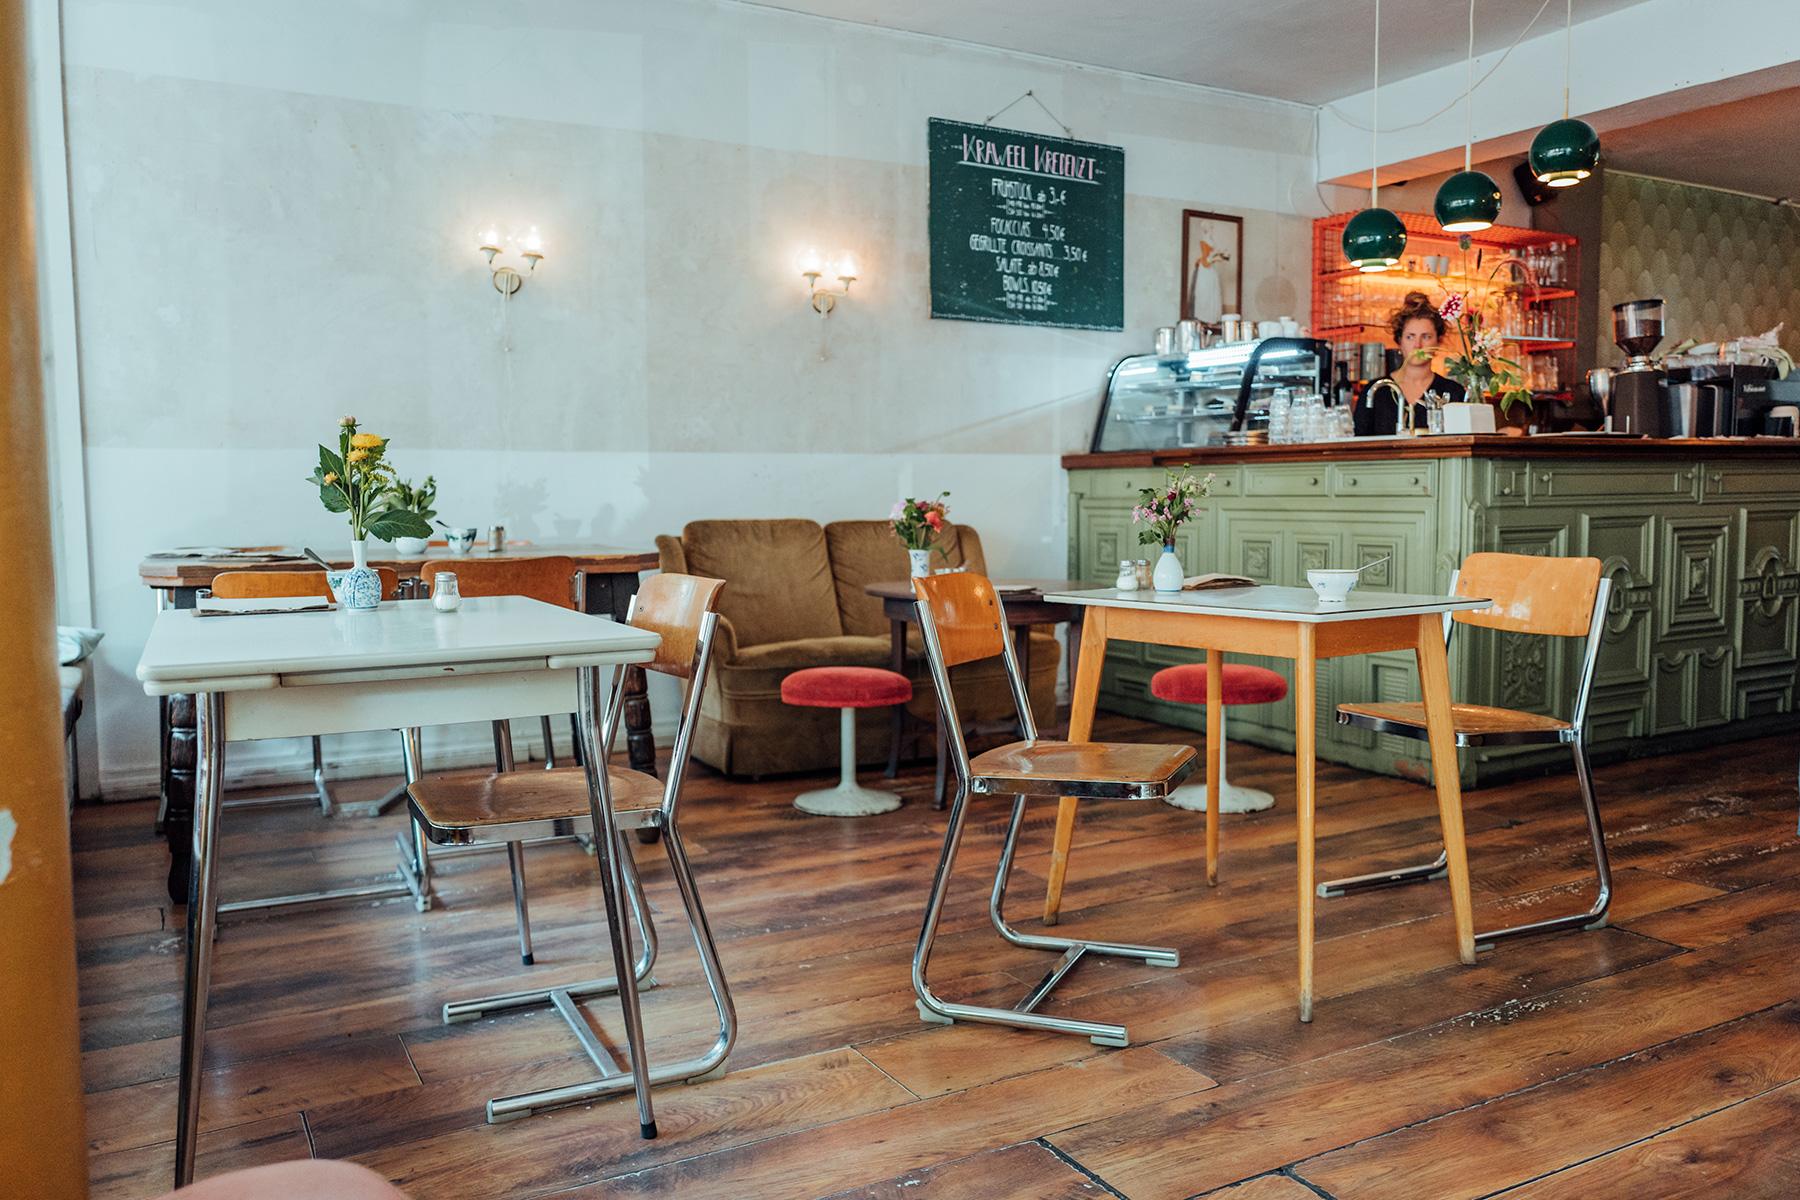 Kraweel StPauli cafe geheimtipp hamburg lisa knauer 03